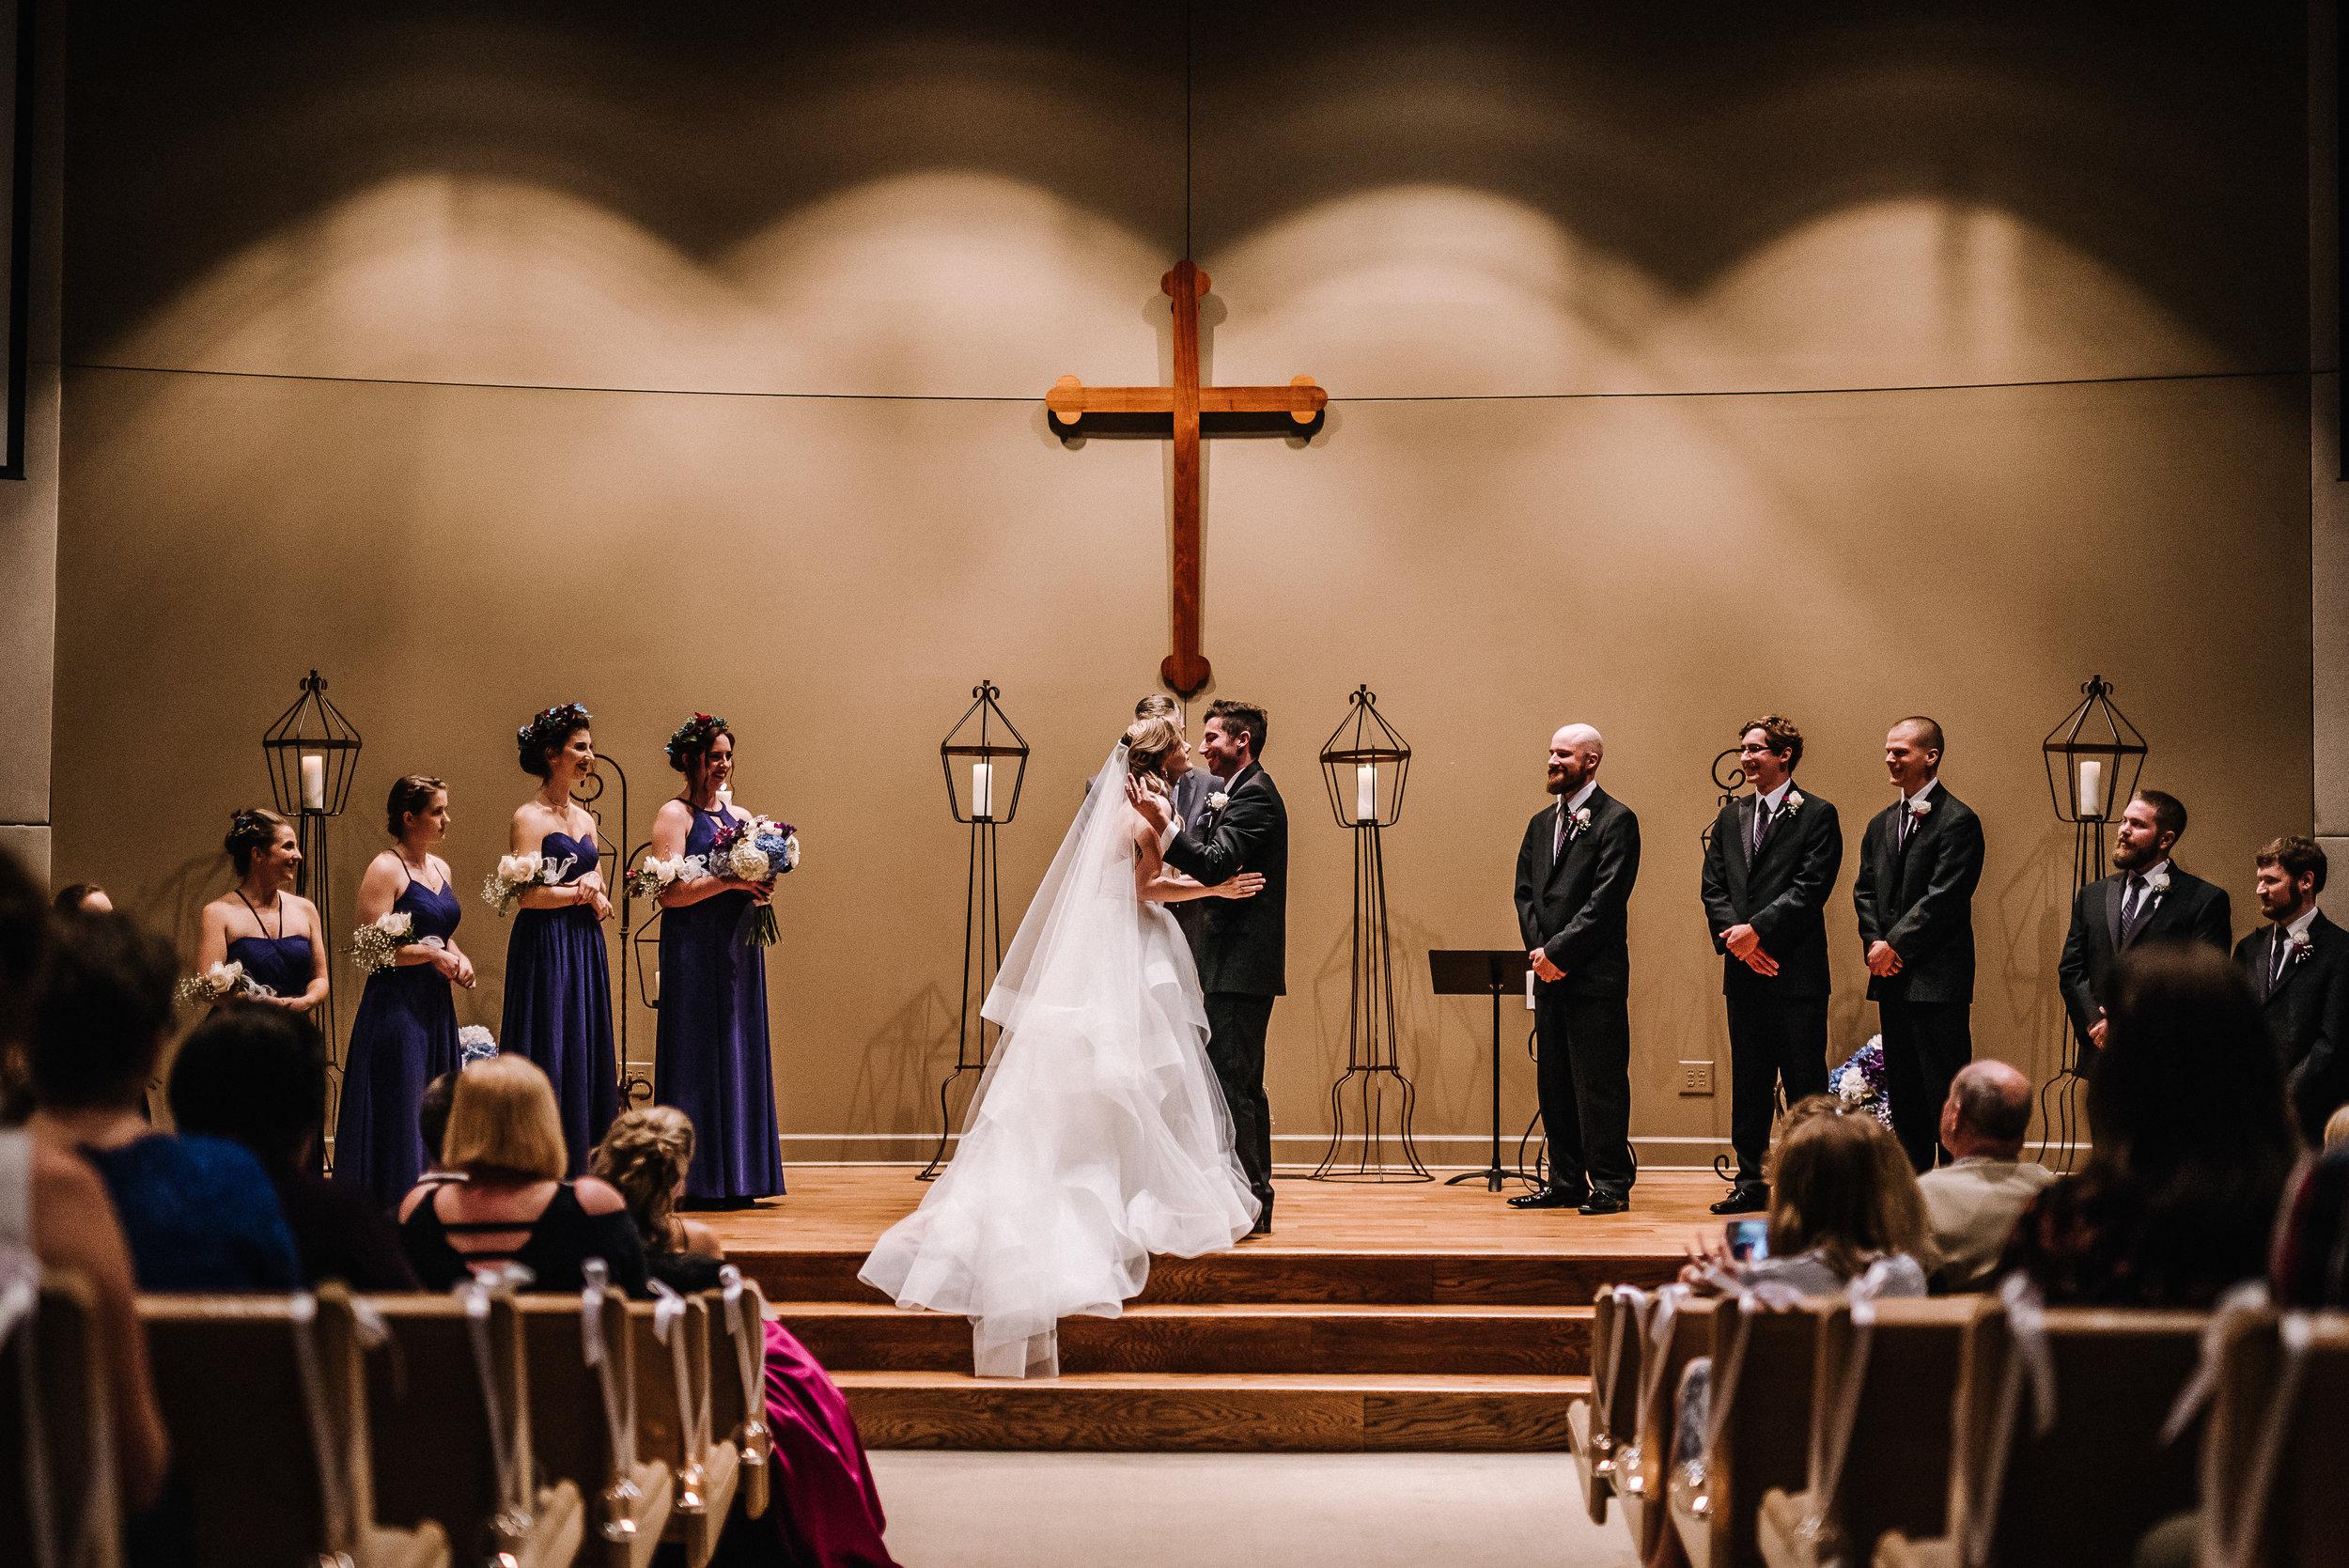 Lucchesi-Wedding_Shelby-Farms_Ashley-Benham-Photography-664.jpg